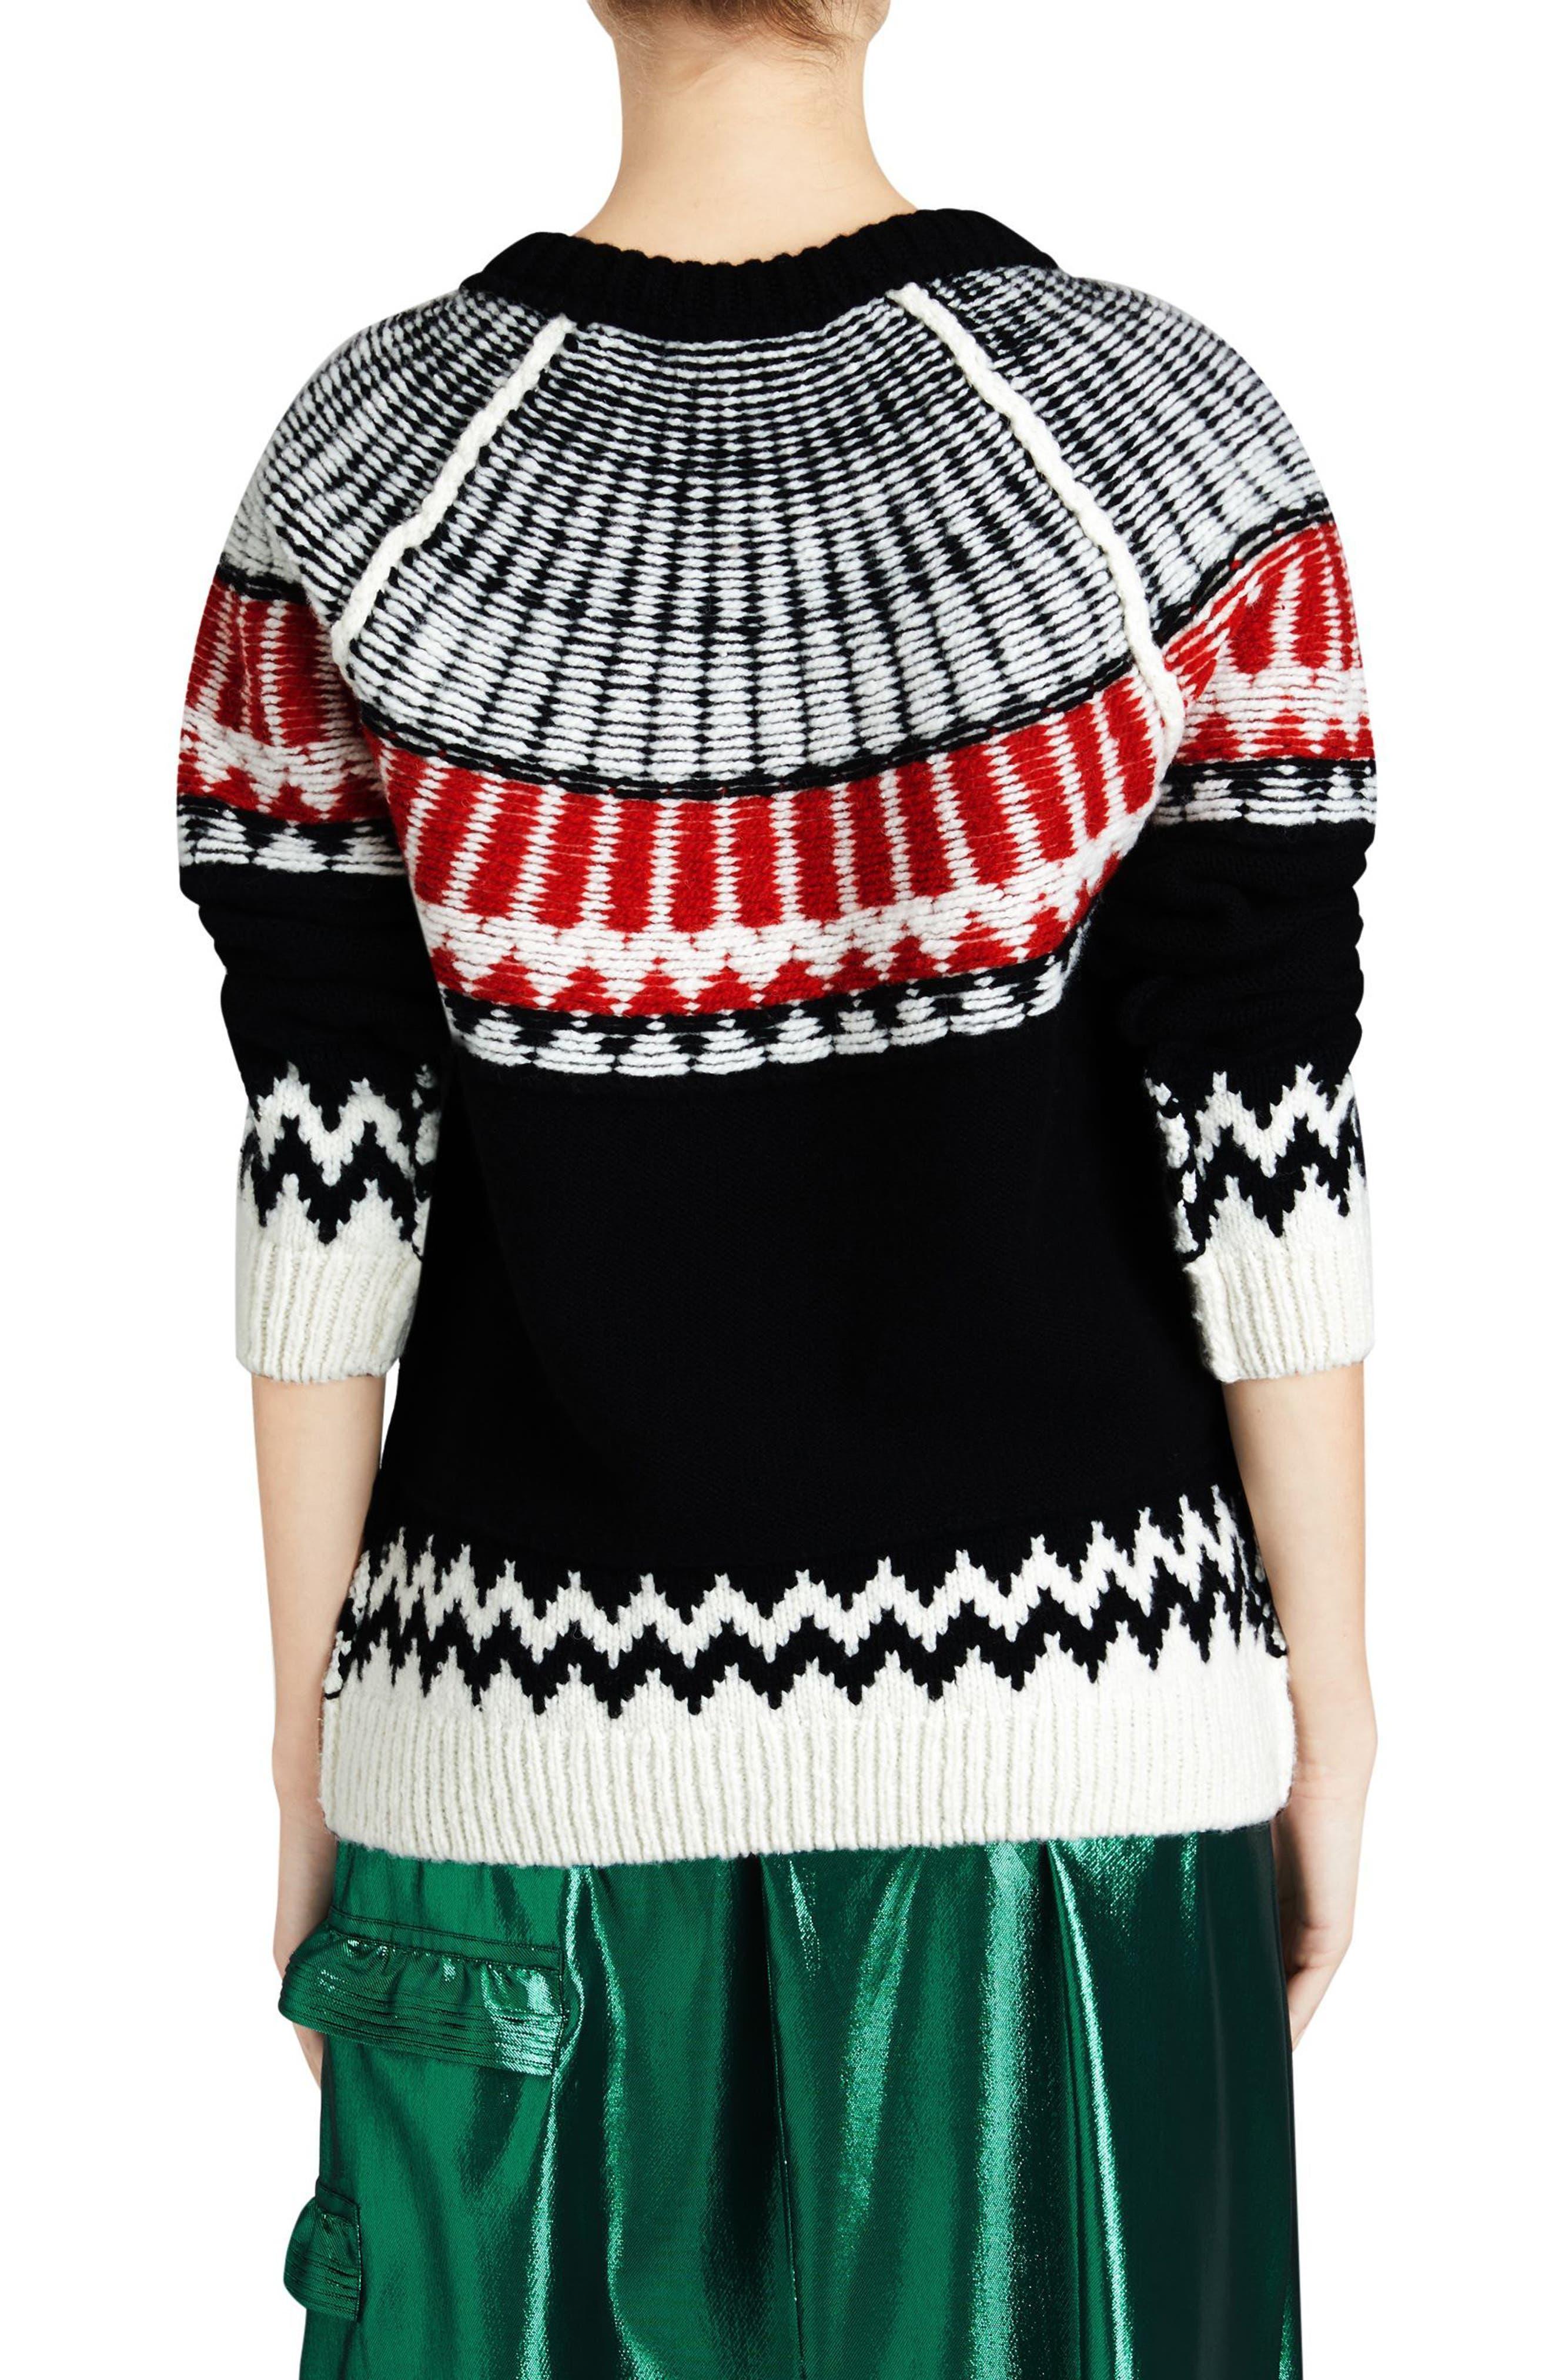 Trycroft Fair Isle Wool Blend Sweater,                             Alternate thumbnail 2, color,                             001